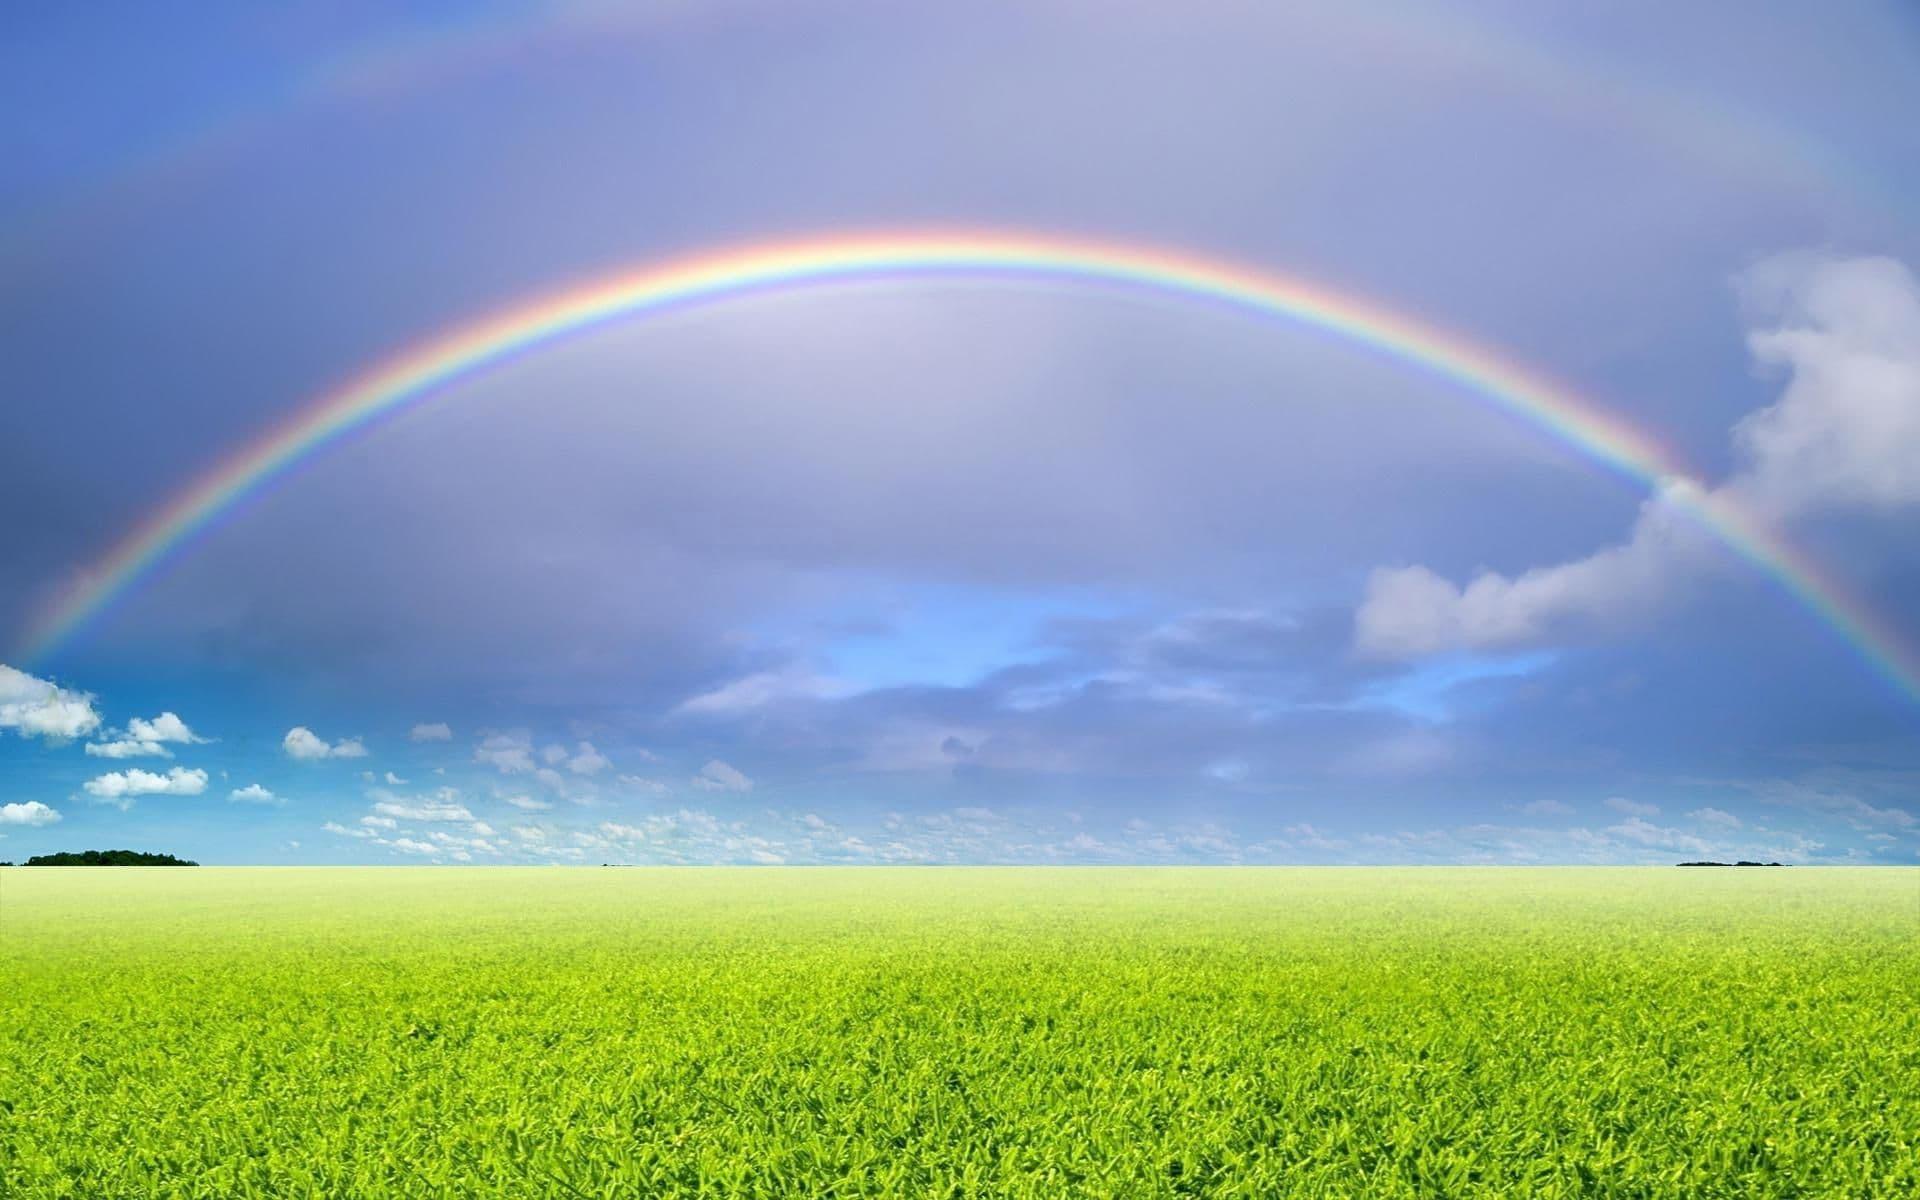 Rainbow Dream Meaning